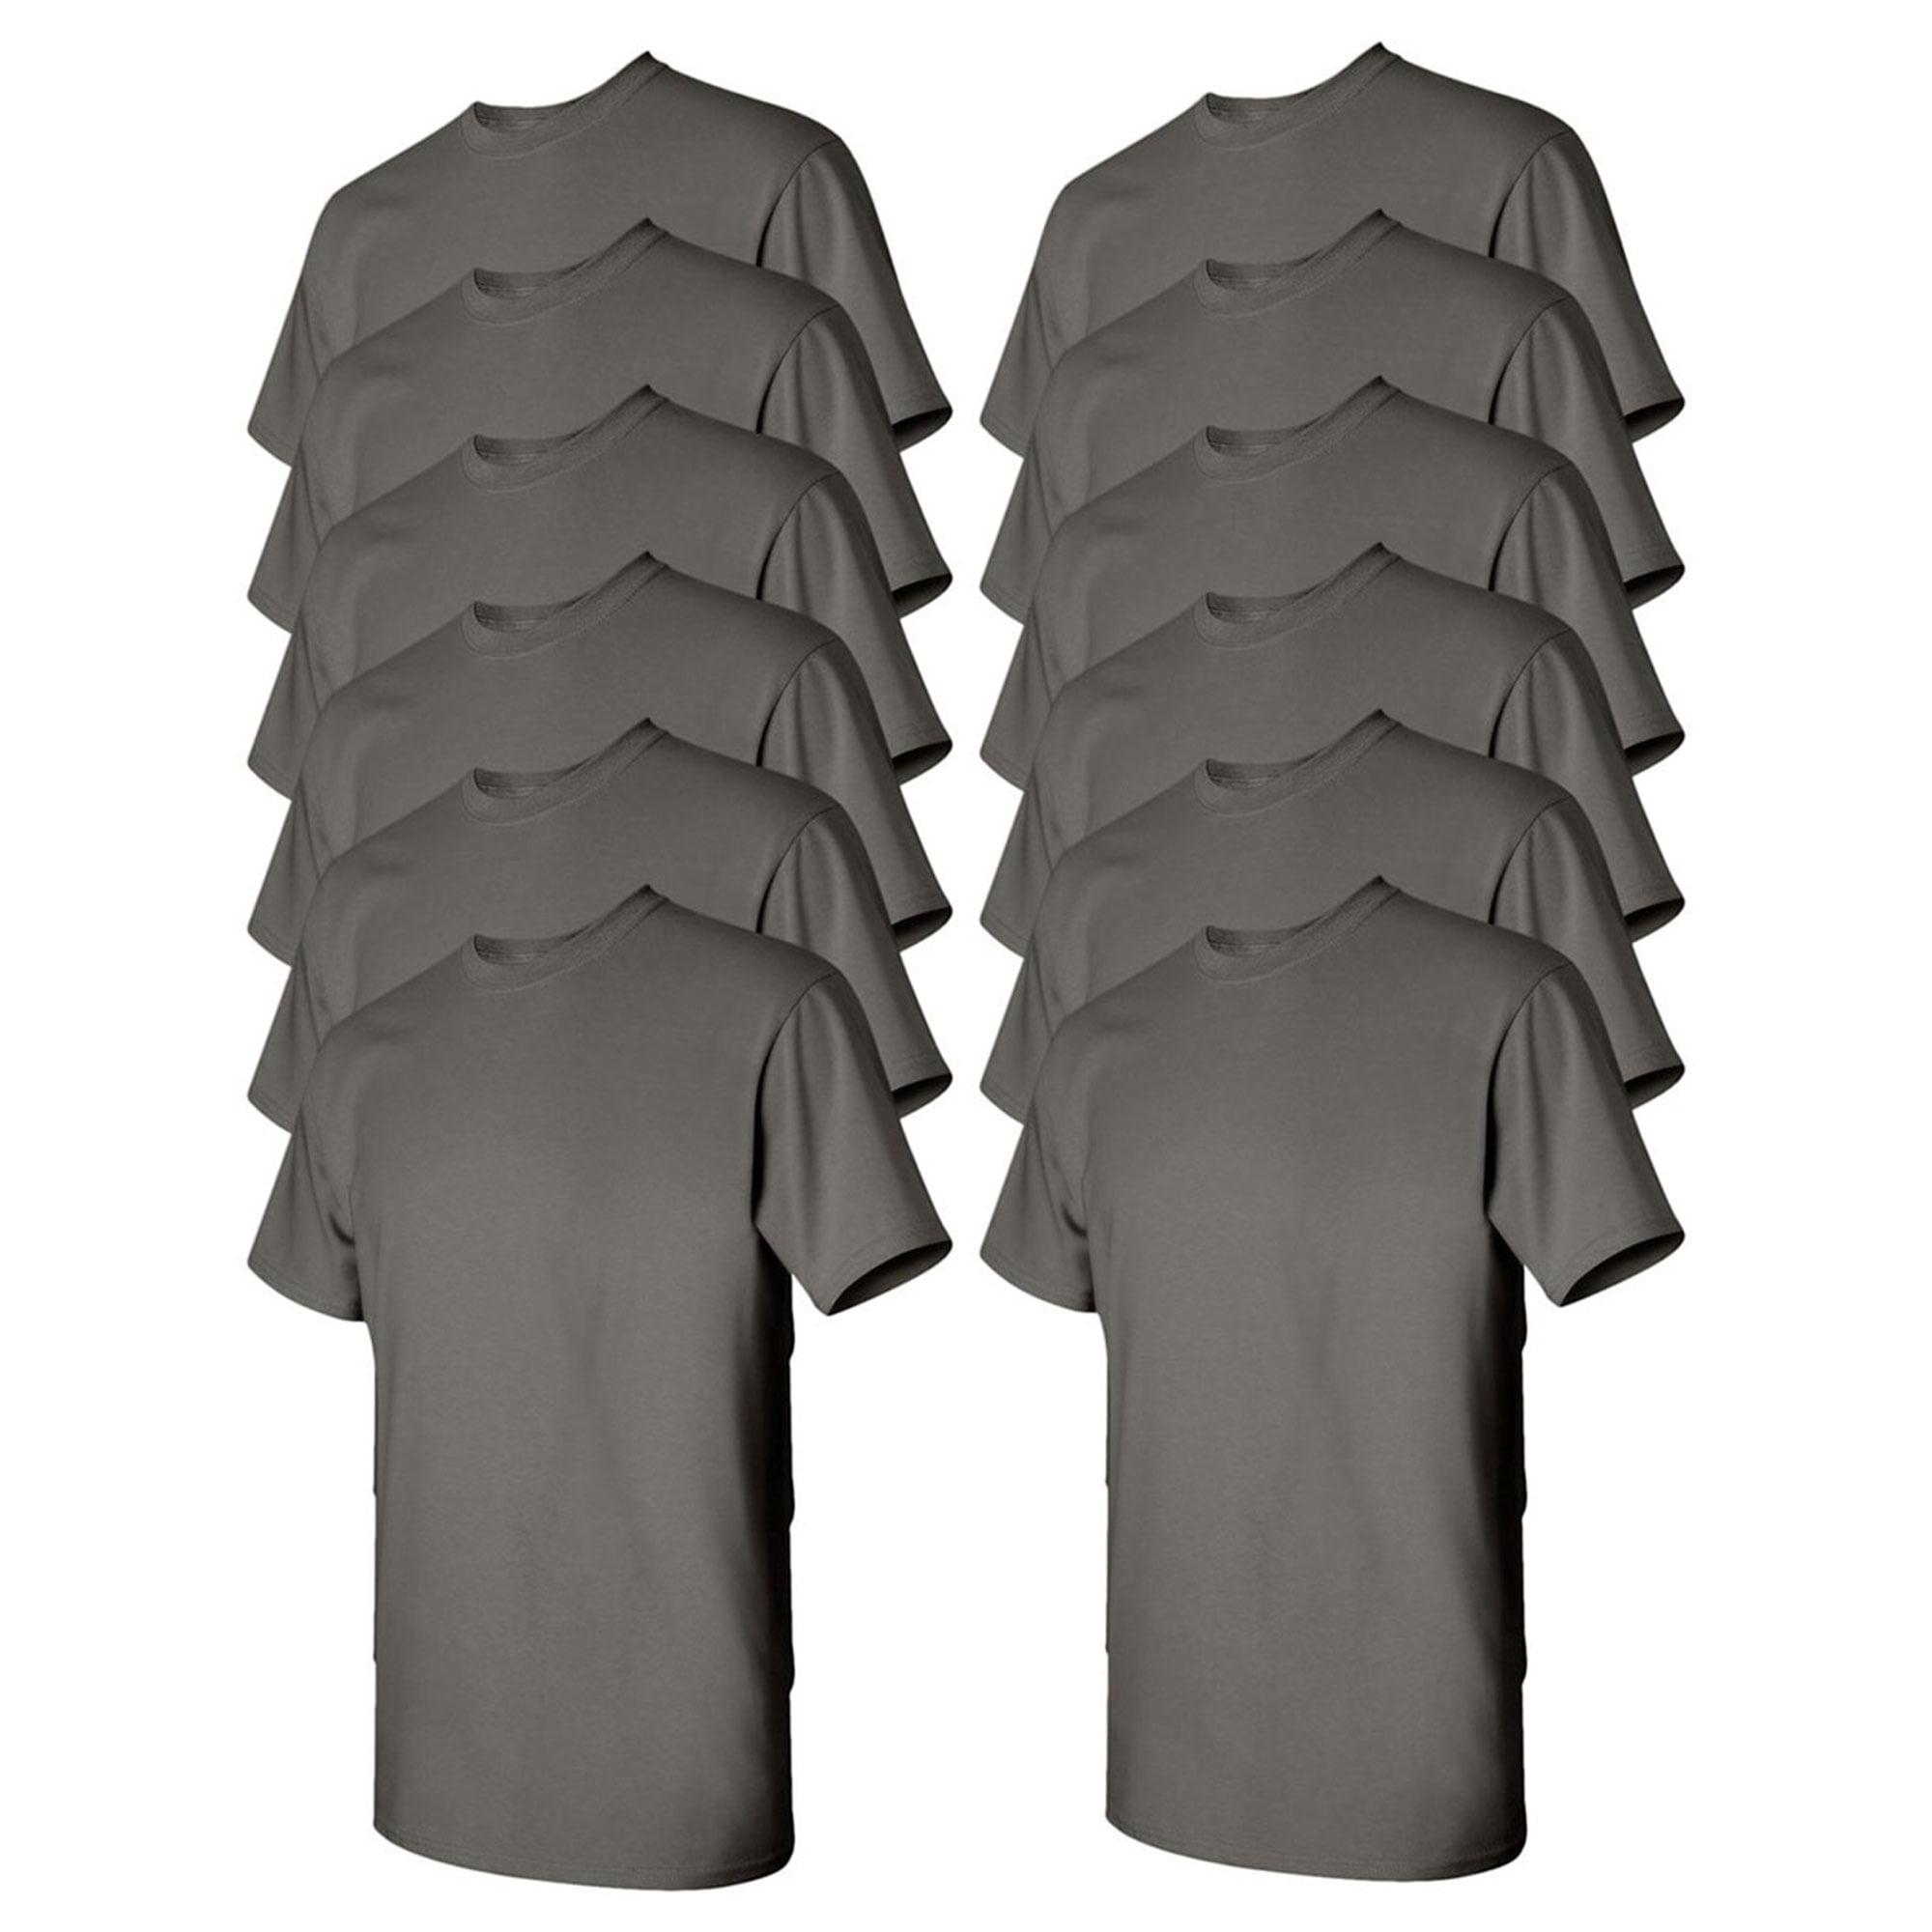 Gildan Mens Heavy Cotton T-Shirt, Pack of 10